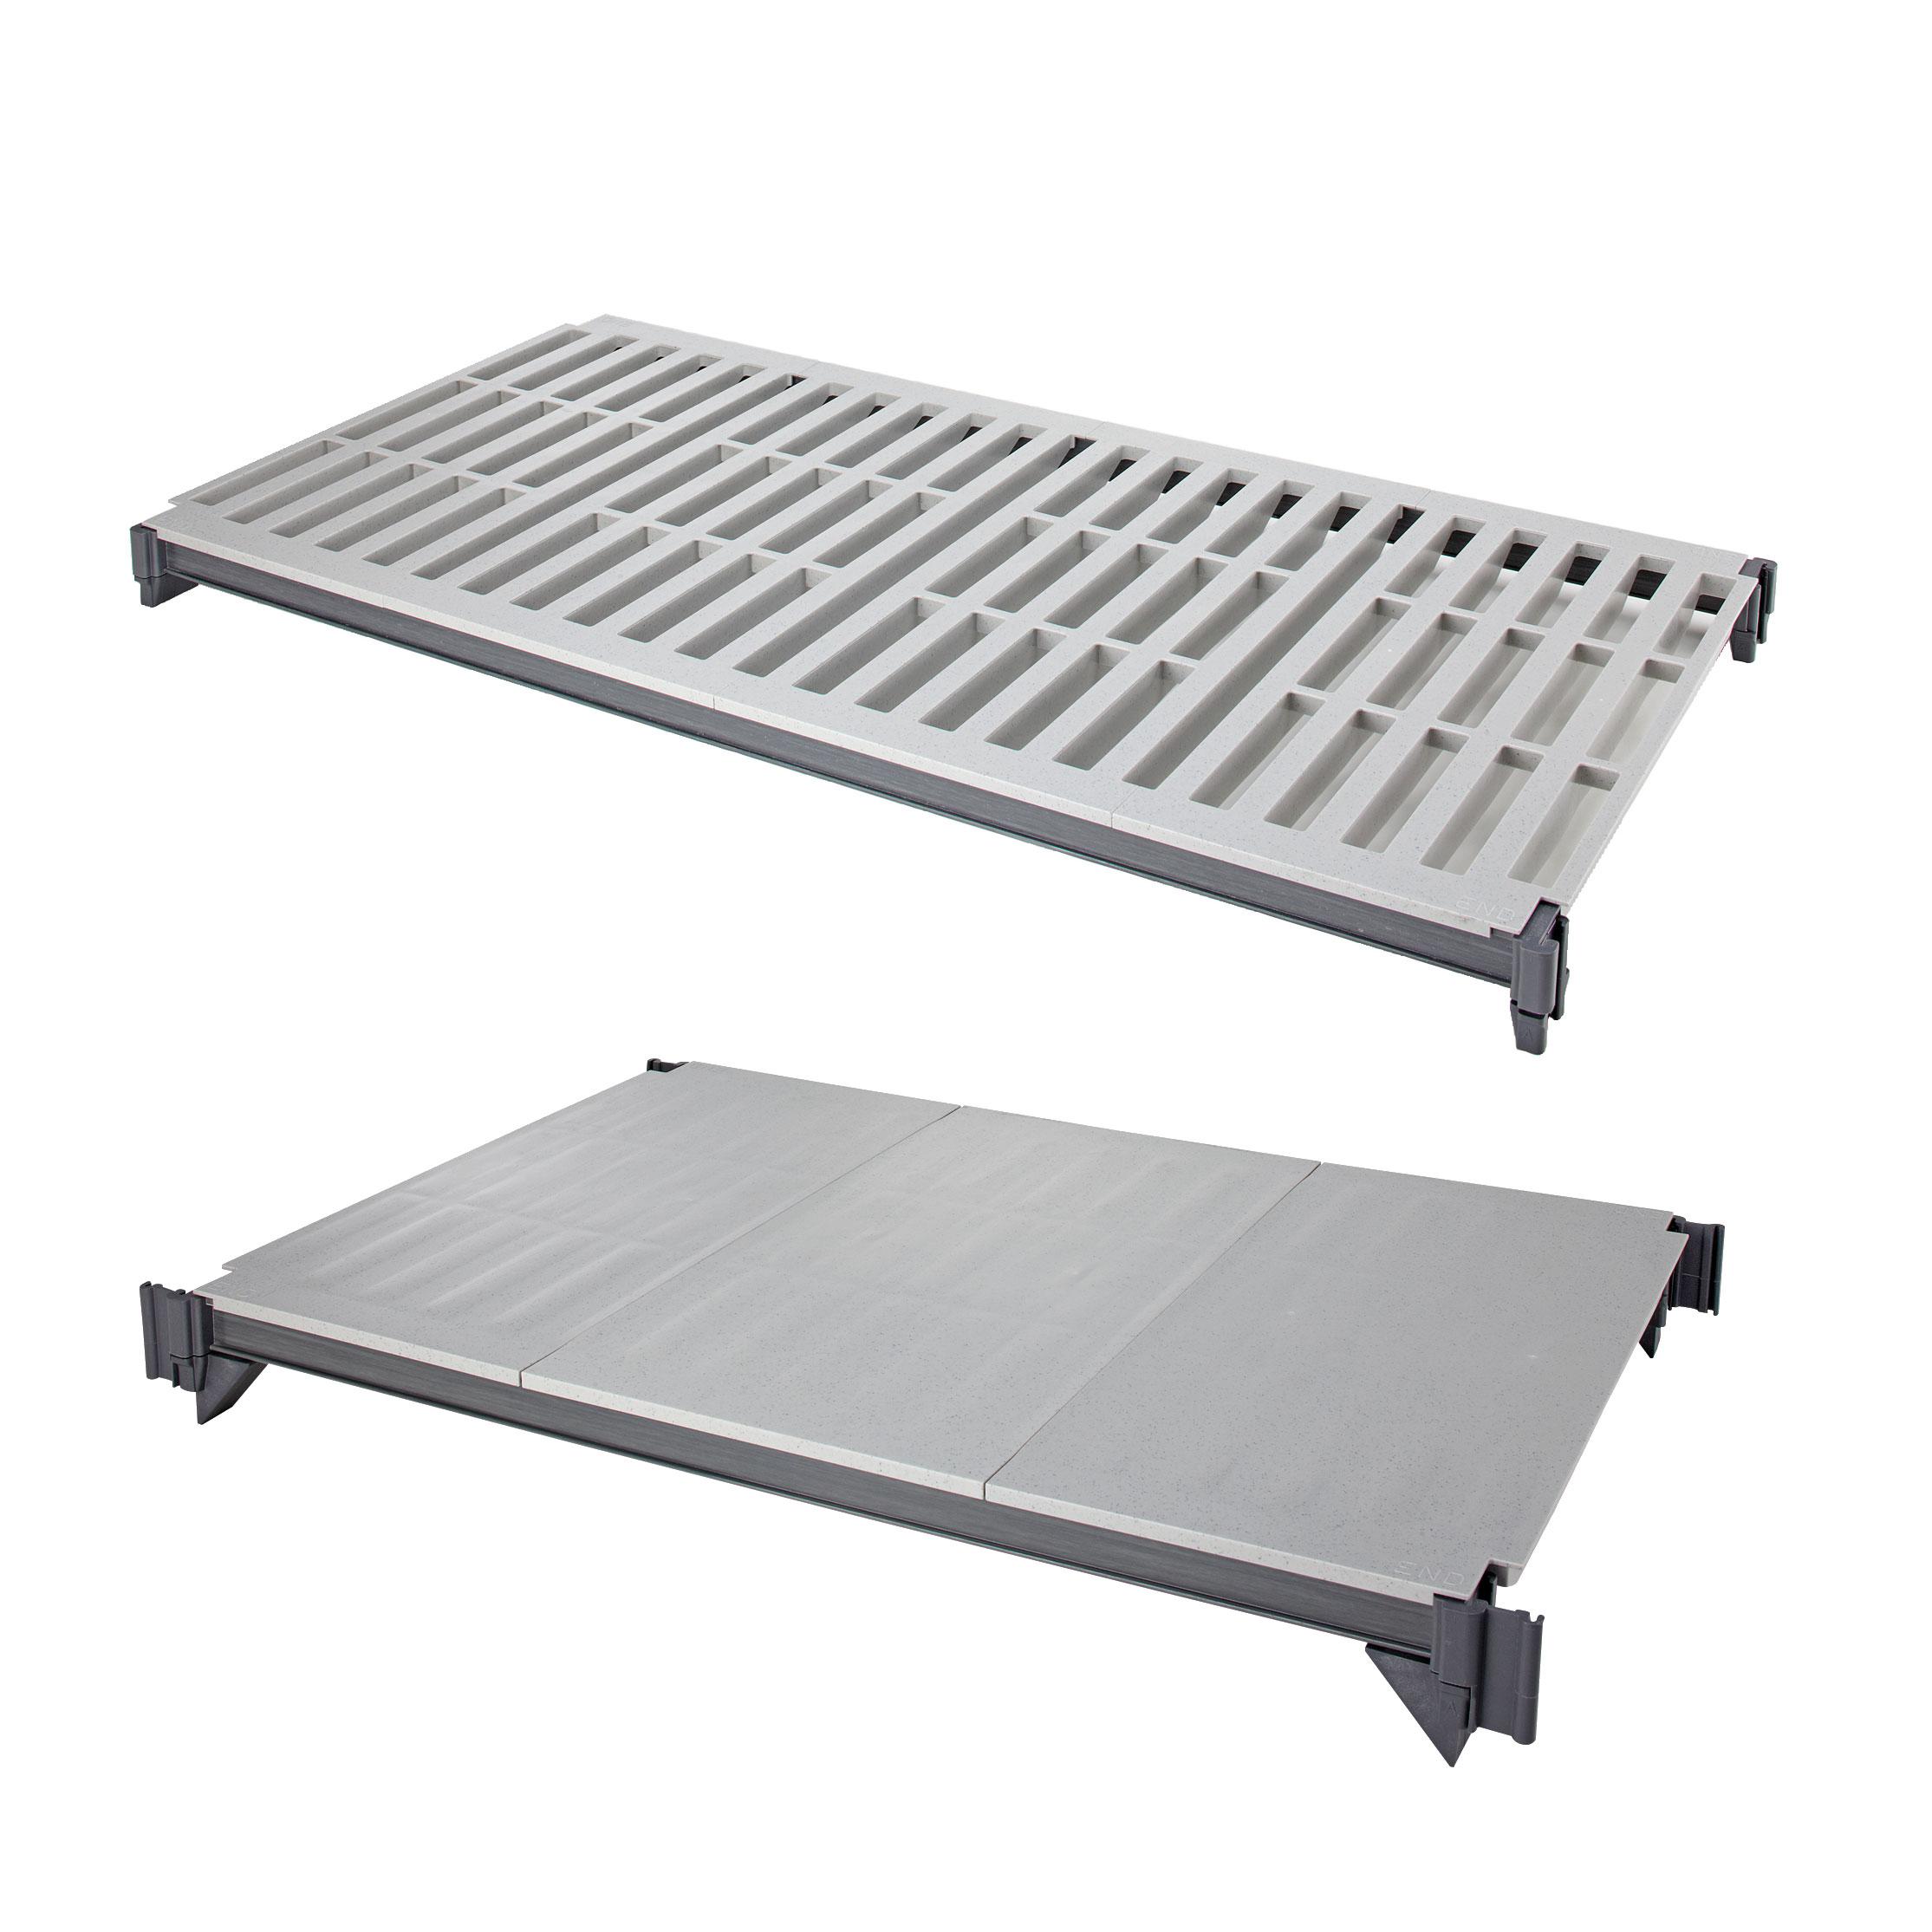 Cambro ESK1848VS5580 shelving/shelving systems